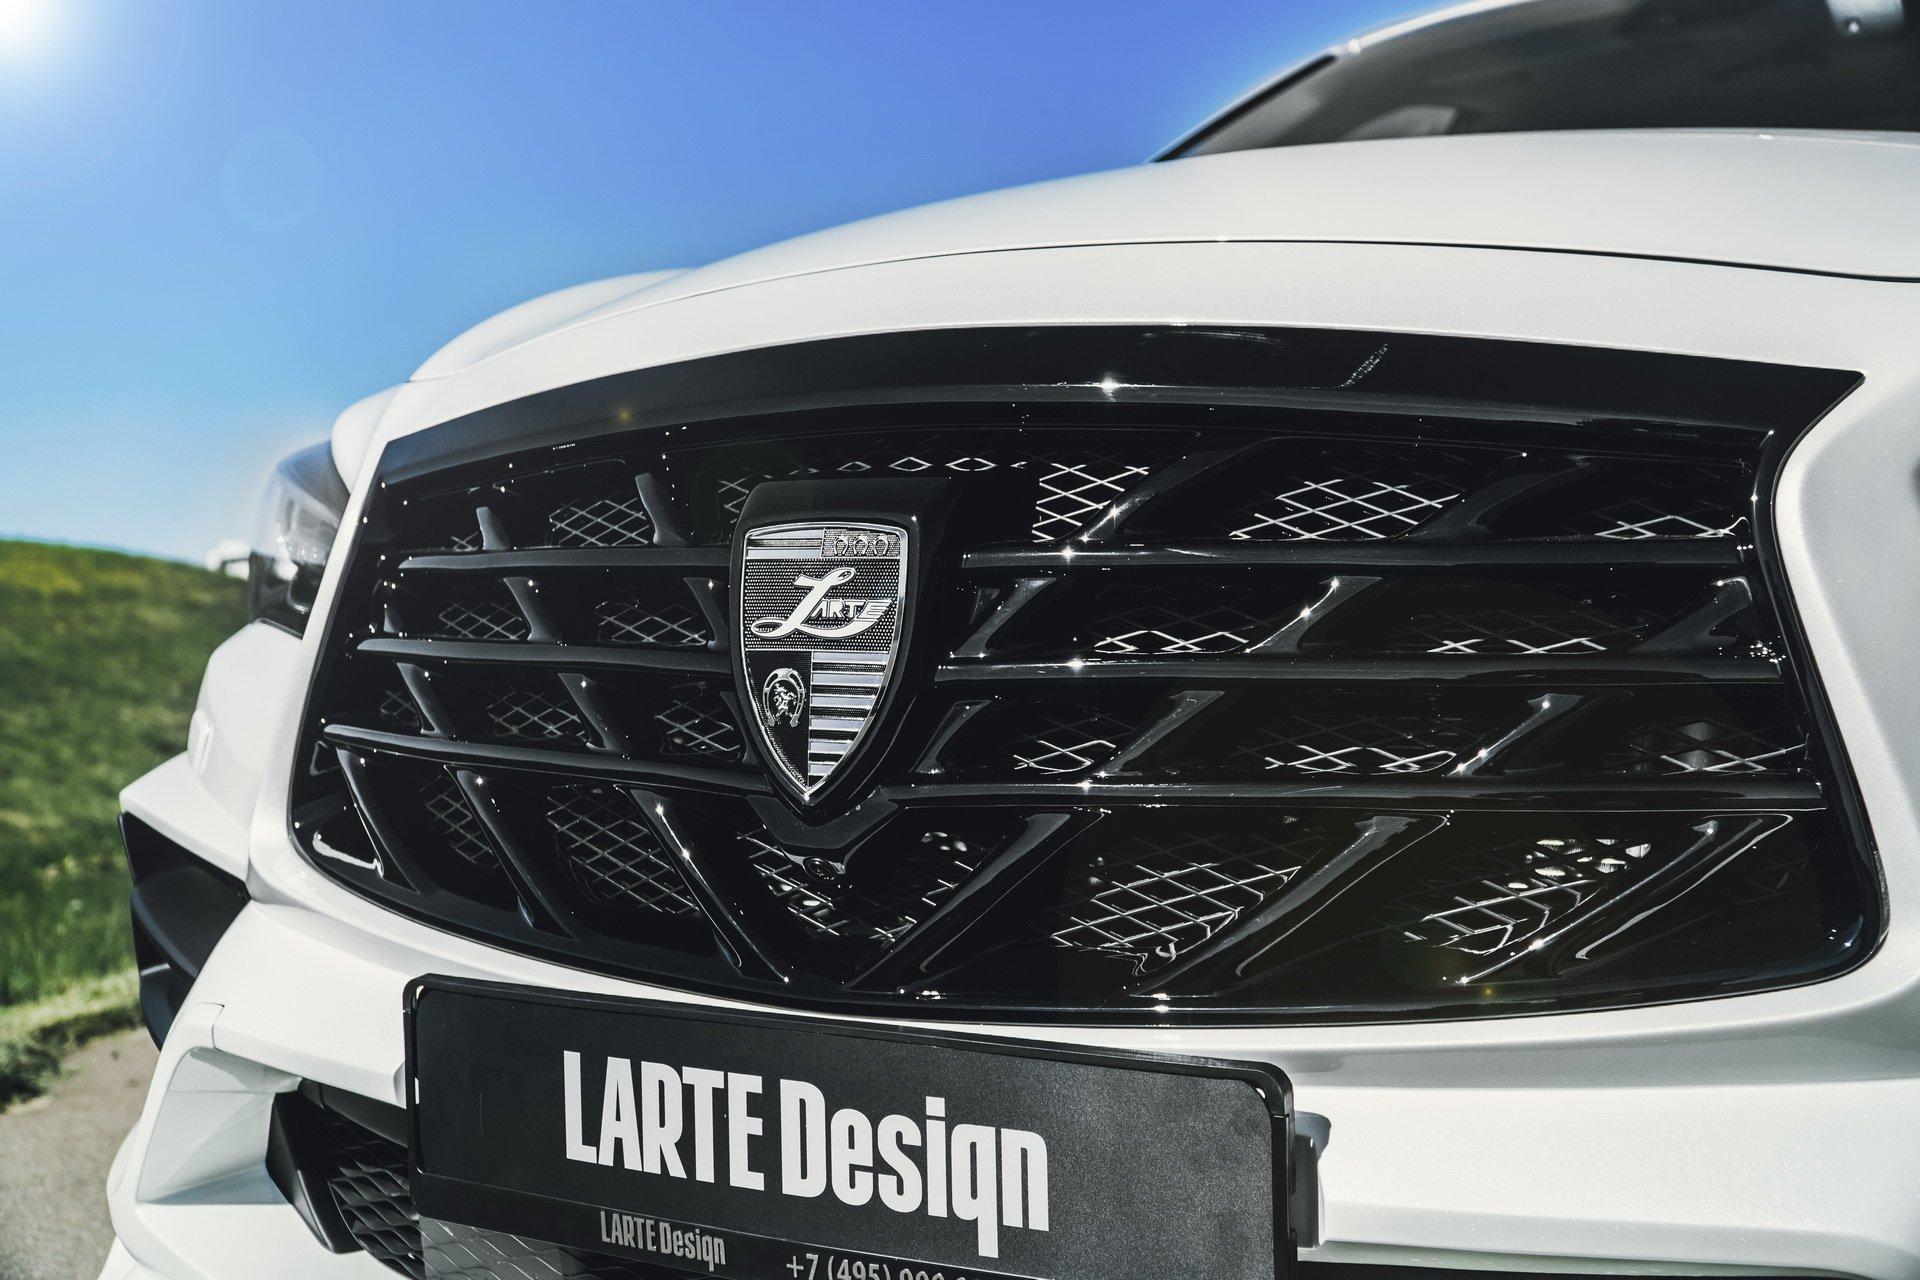 Infiniti-QX60-by-Larte-Design-11